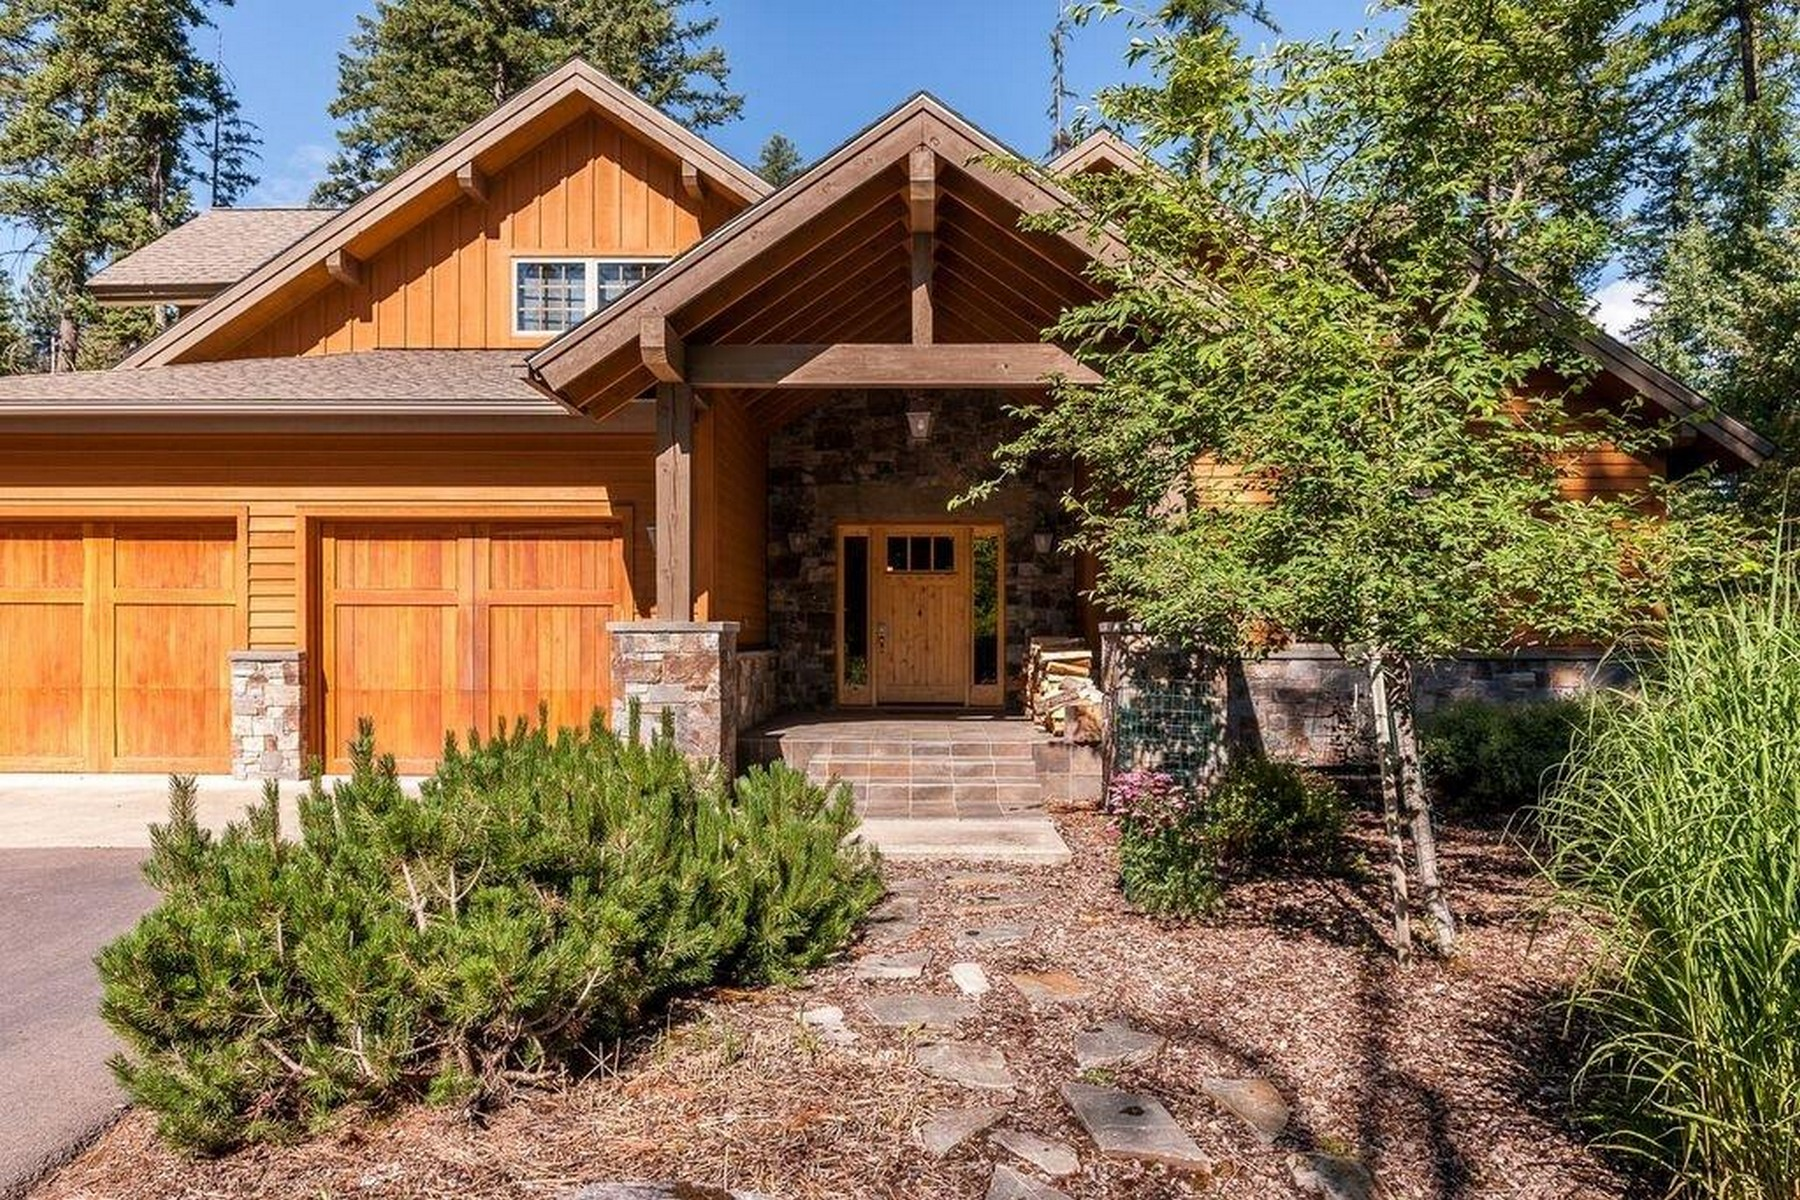 Single Family Home for Sale at 12355 Cygnet Way , Bigfork, MT 59911 12355 Cygnet Way, Bigfork, Montana, 59911 United States